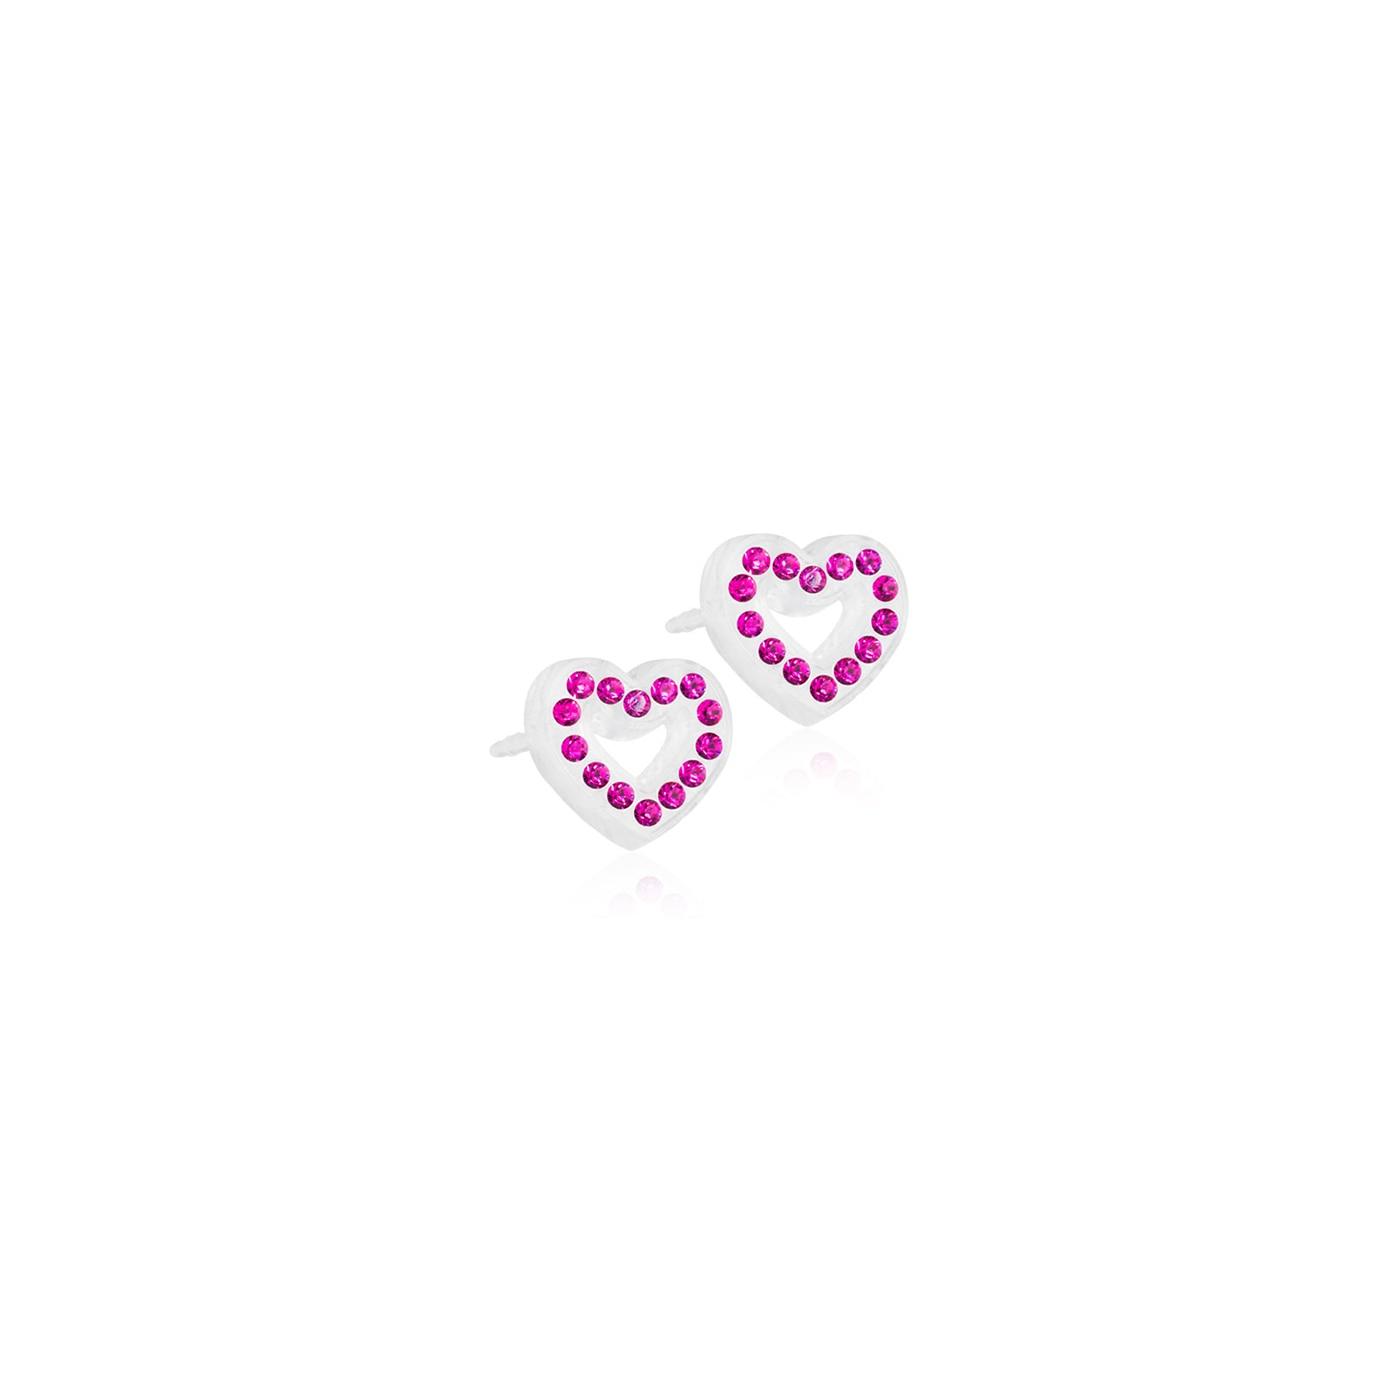 MP Brilliance Heart Hollow 10 mm, Fuchsia